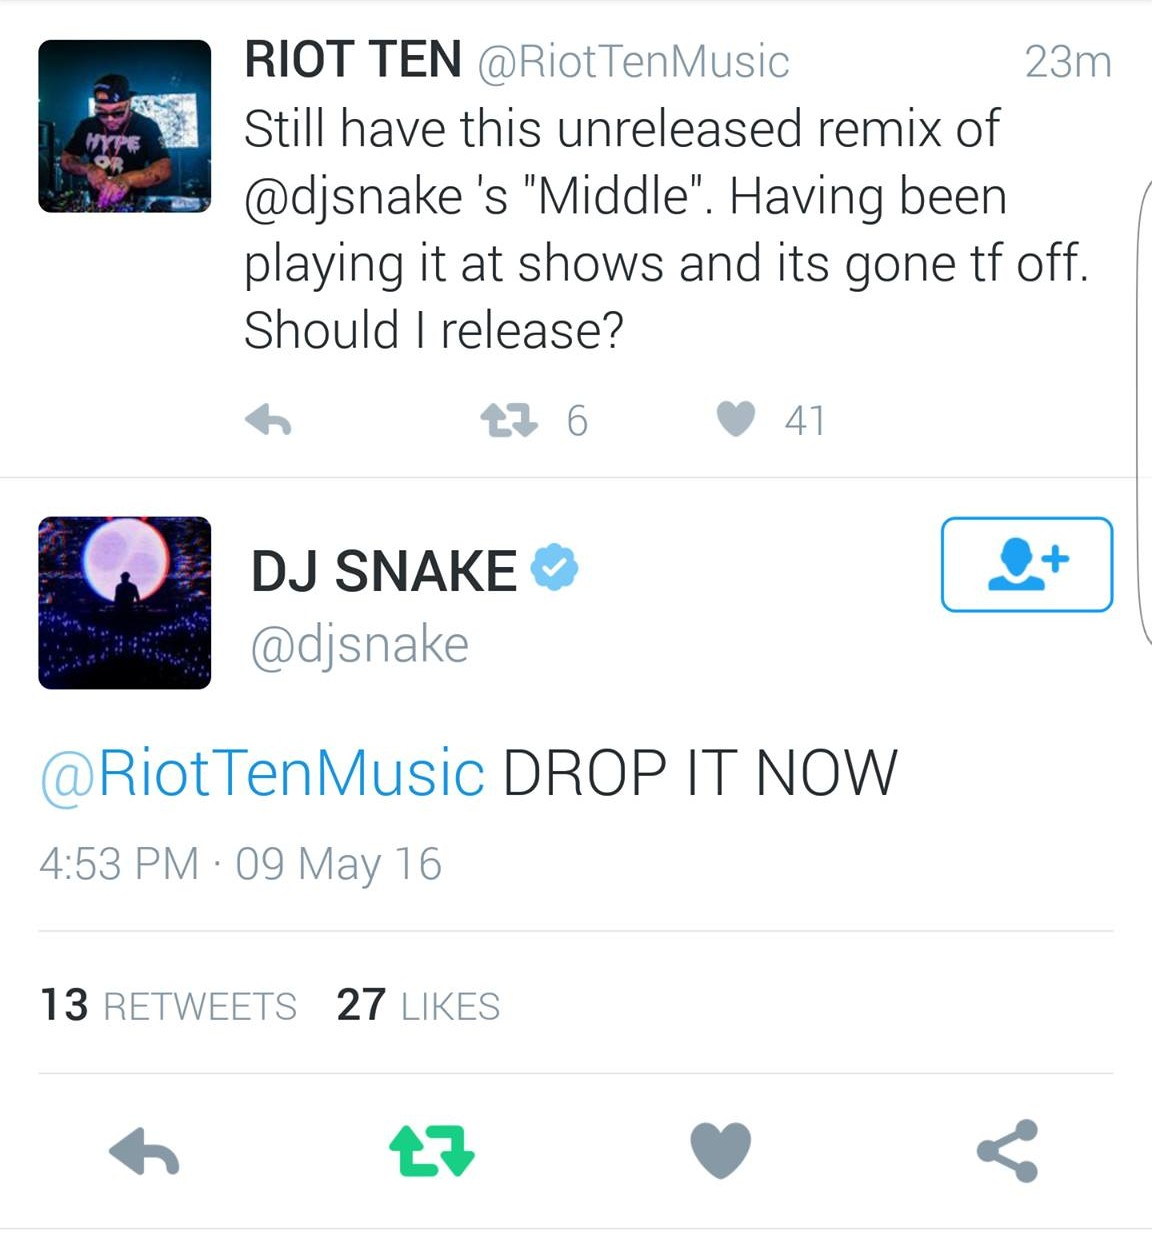 dj snake riot ten middle remix twitter